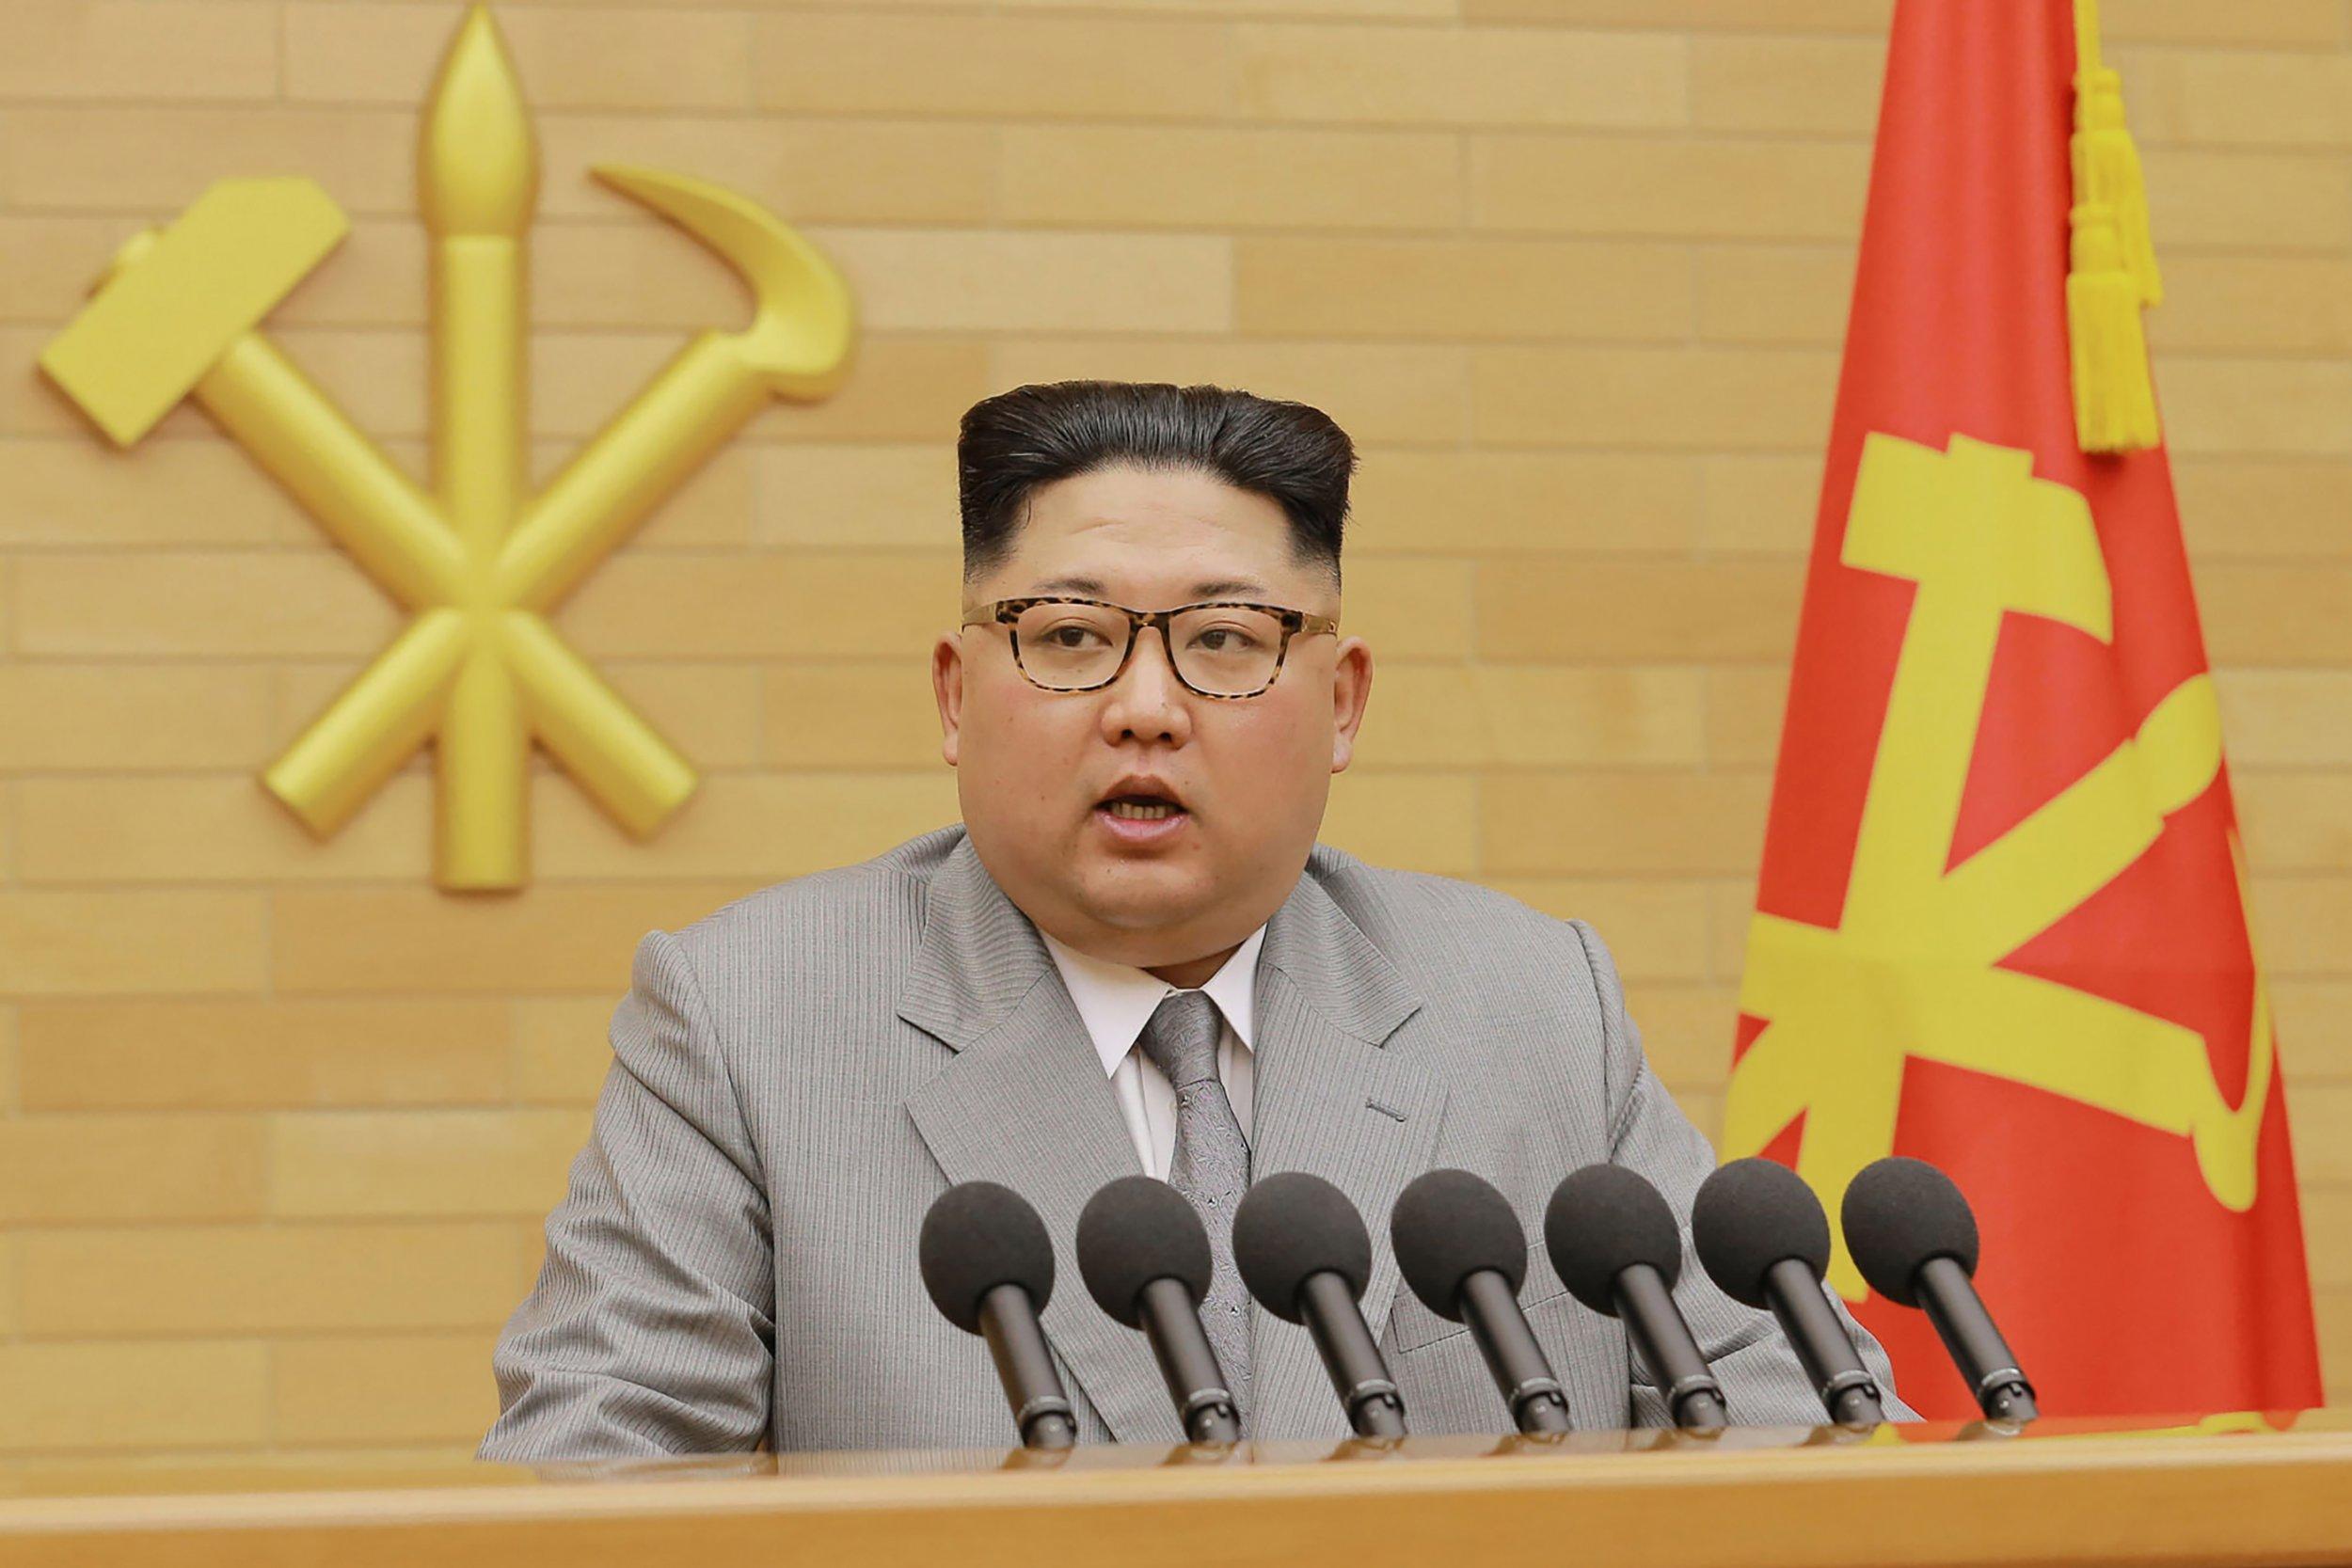 01_02_North_Korea_Kim_Jong_Un